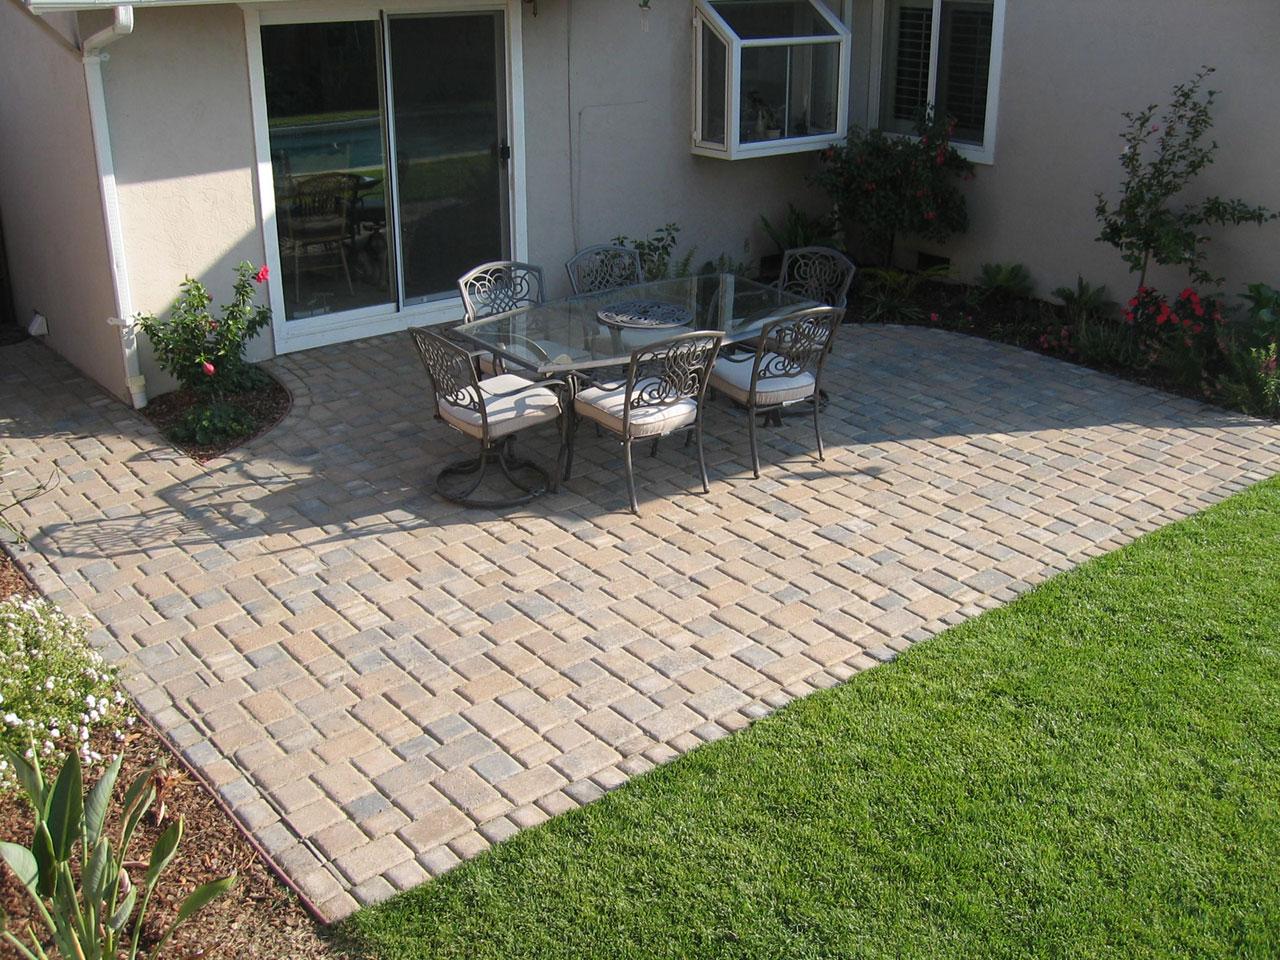 design of paver patio ideas patio design plan brick paver patio ideas FINEHWJ